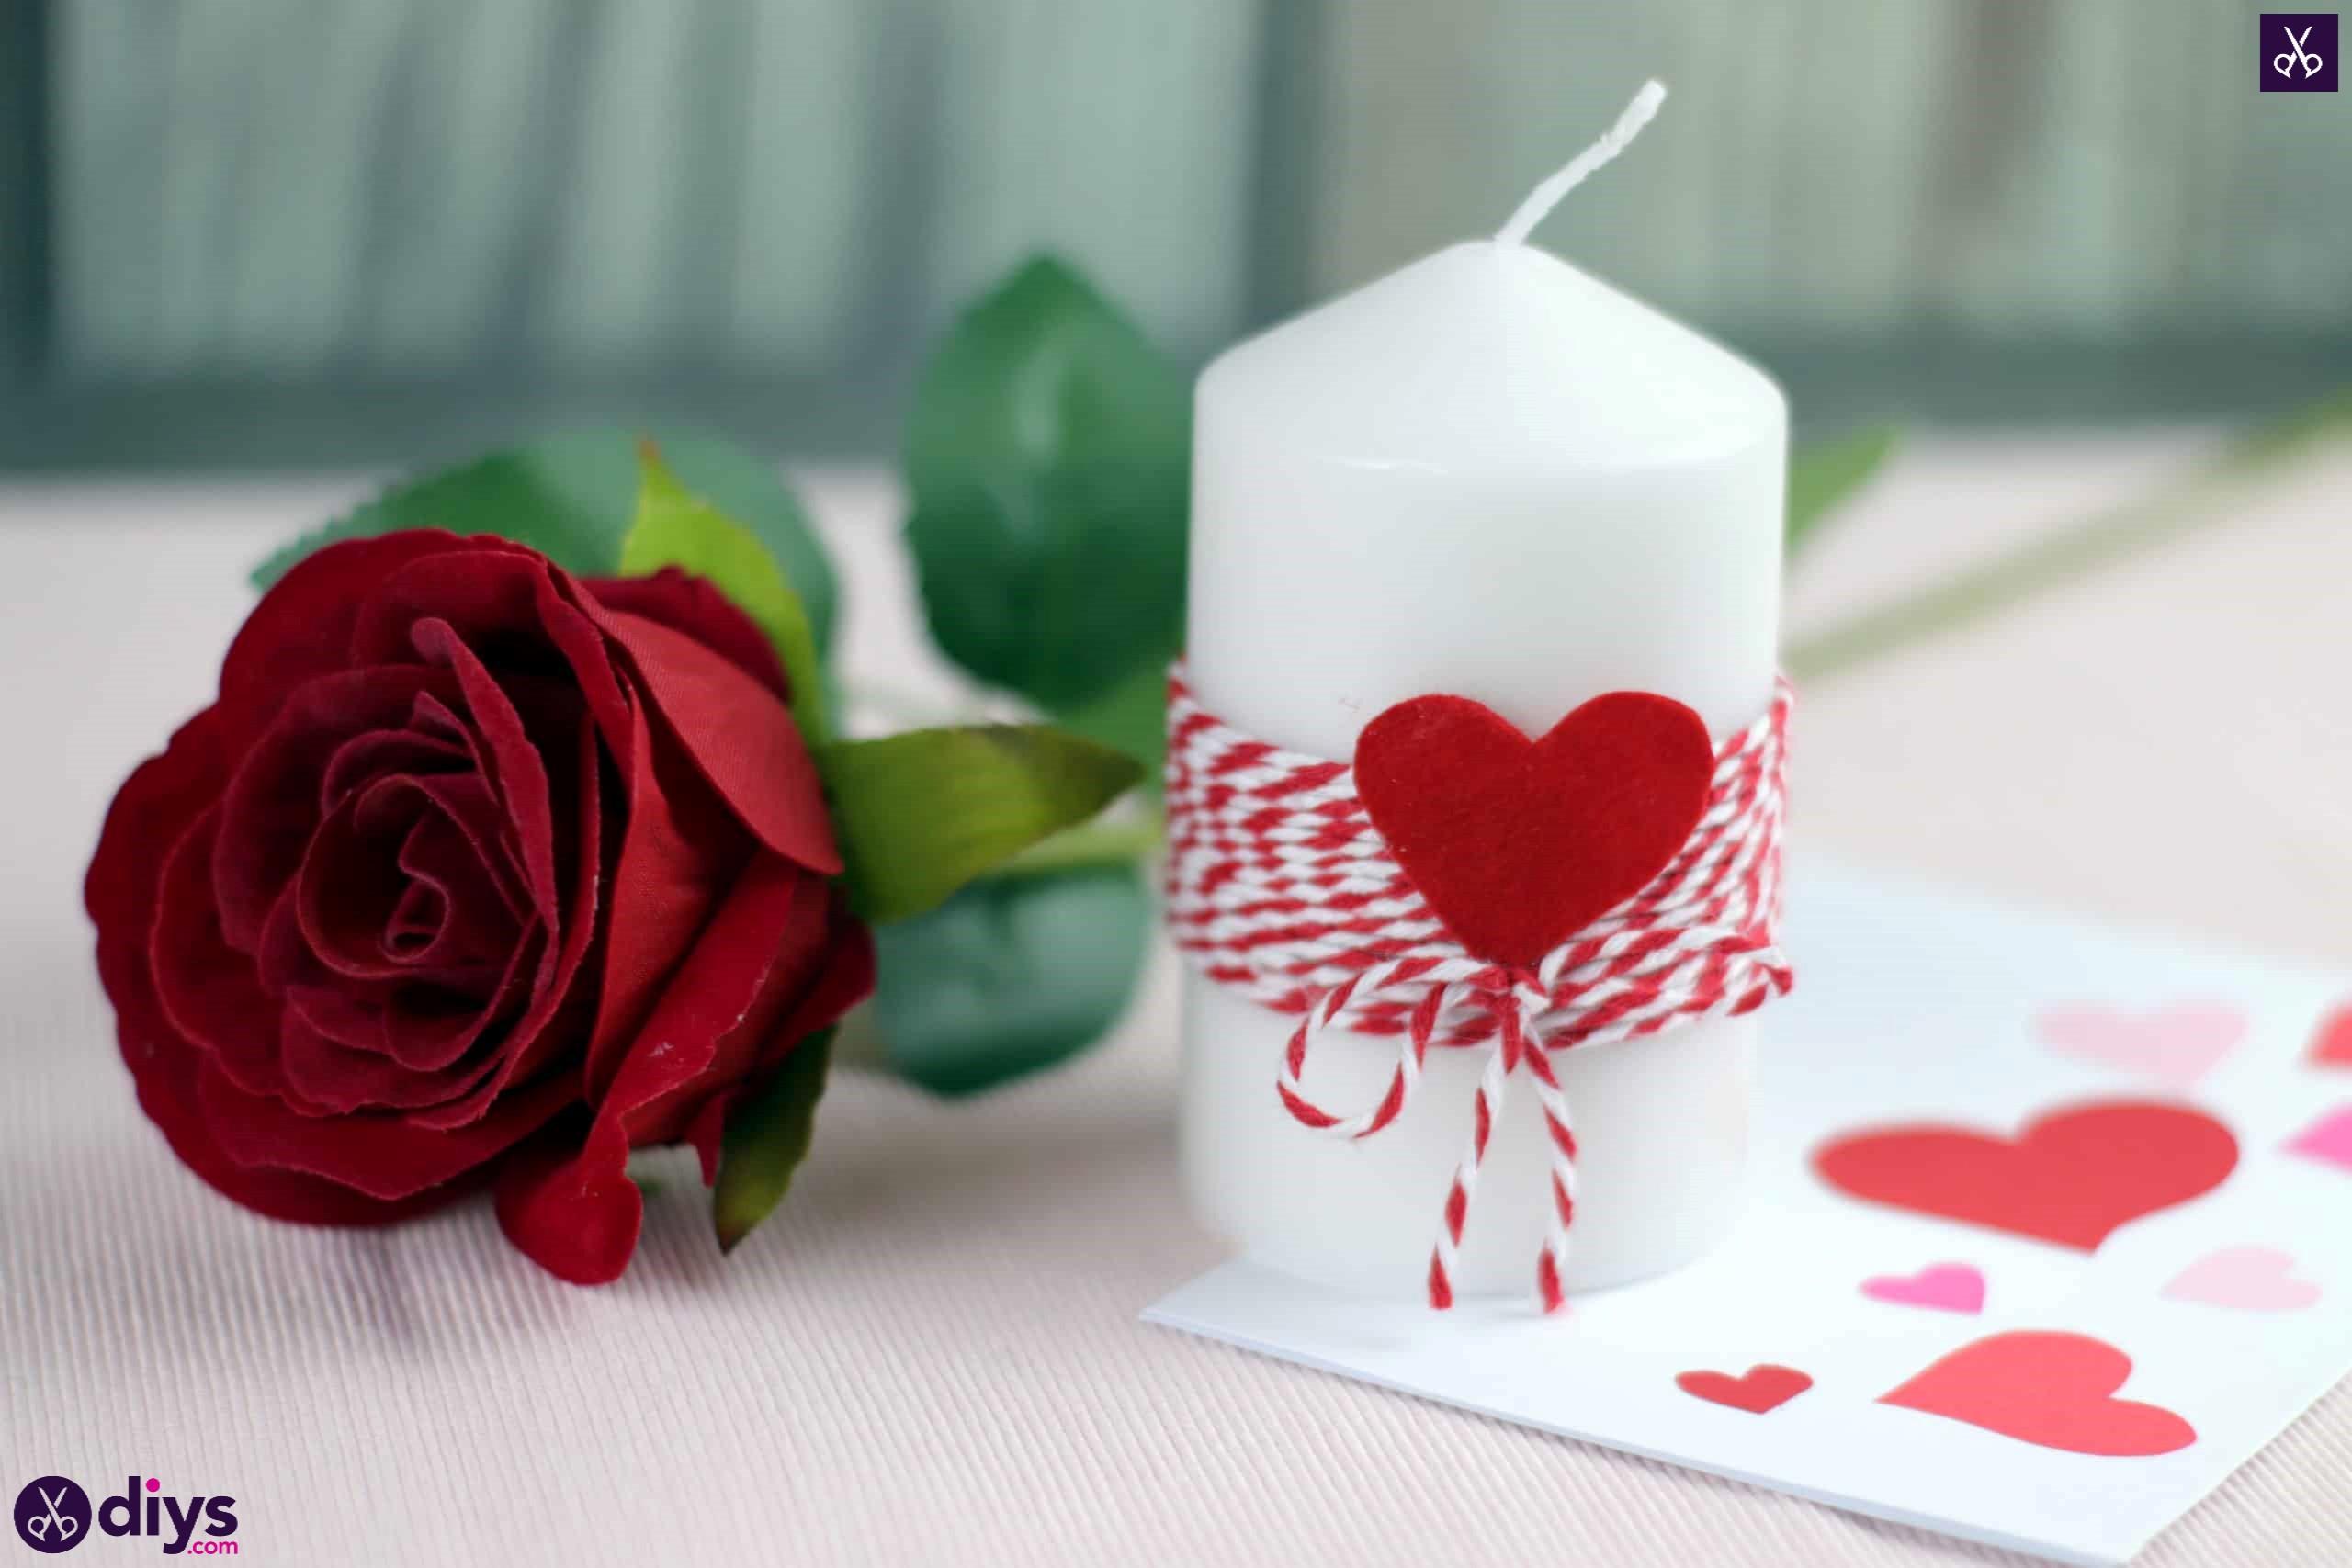 Diy valentine's candle craft decor